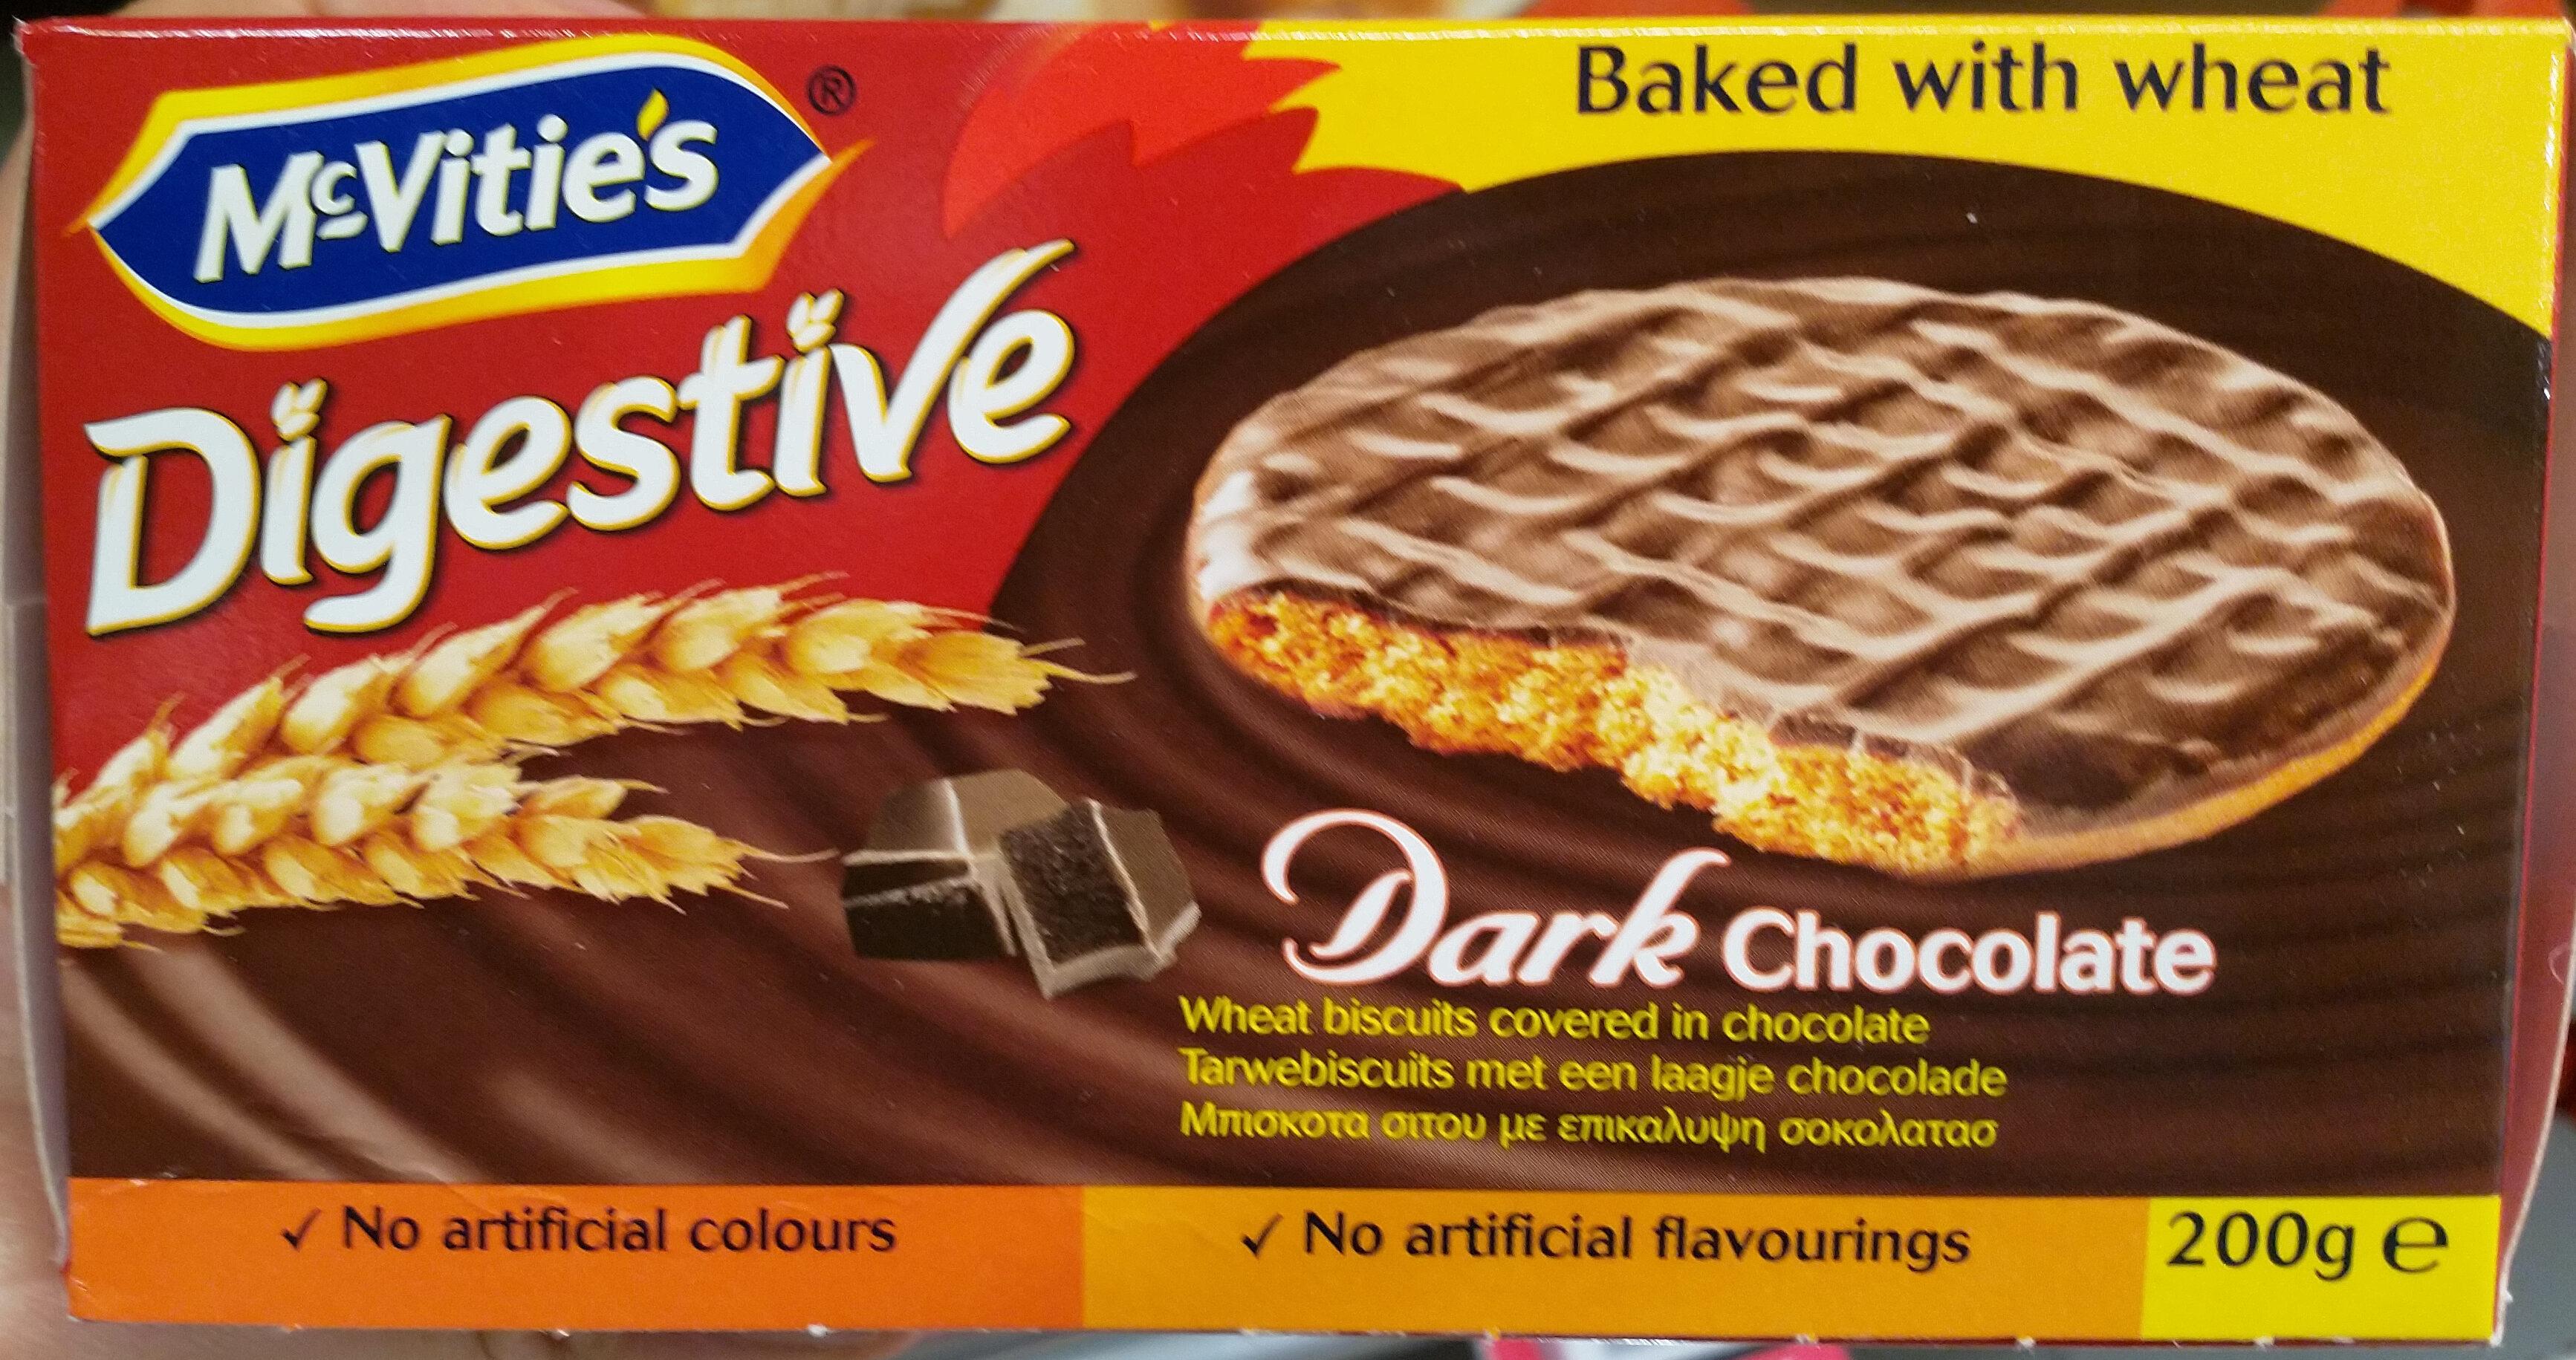 Digestive - Dark Chocolate - Product - fr